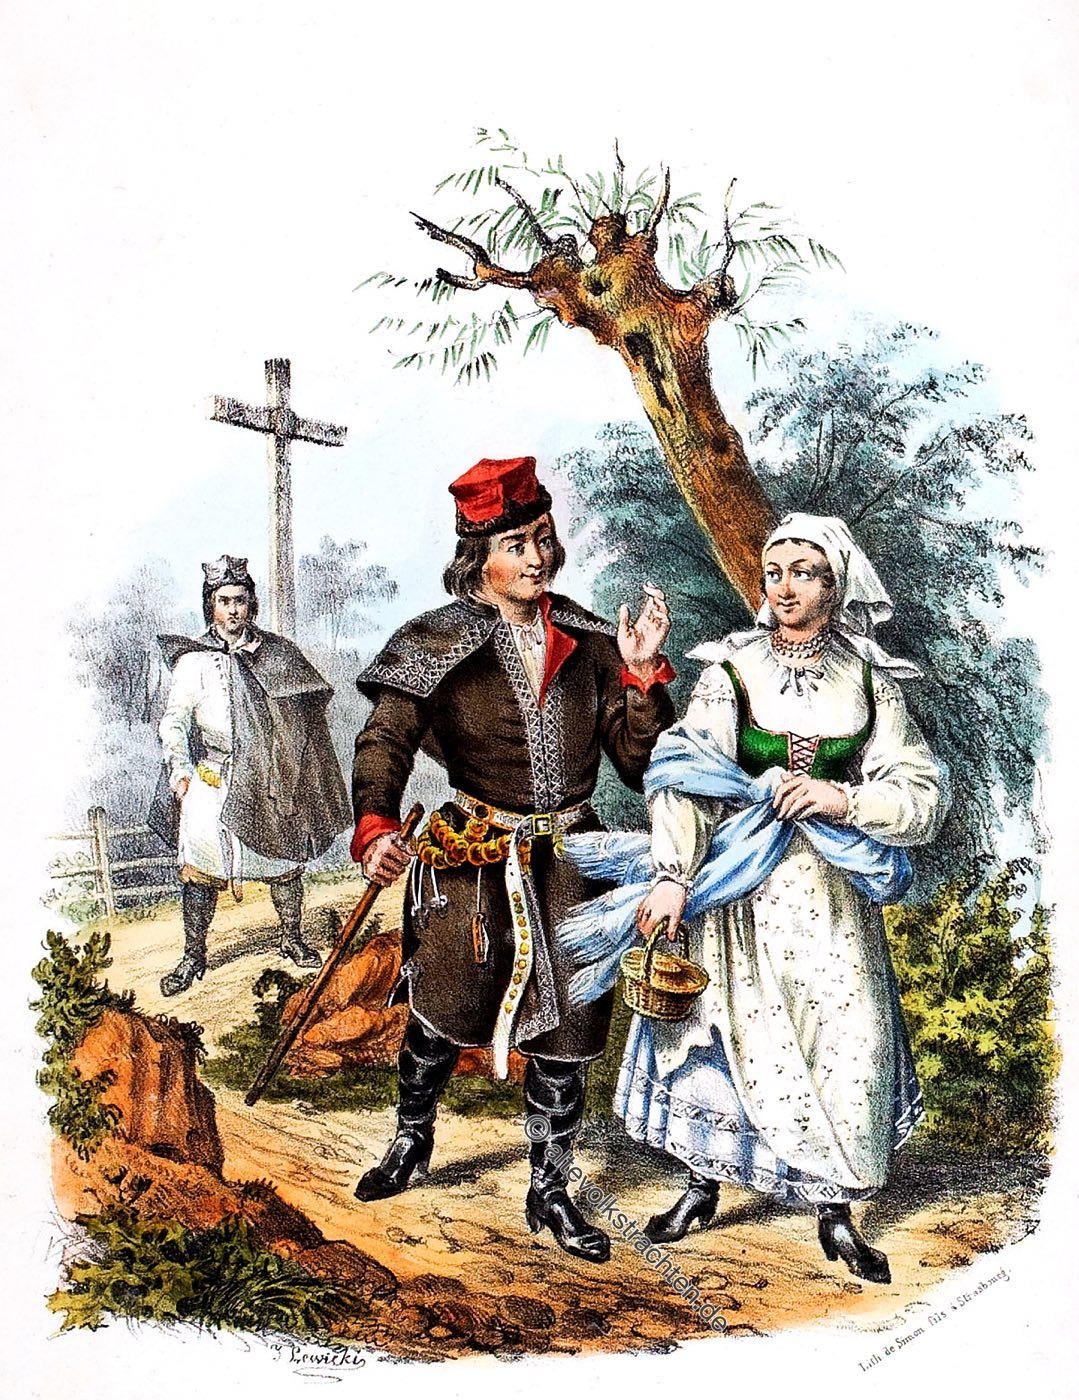 Skalbmierz, Trachten, Szkalmierzacy, Polen, Szkalmier, Landleute, Bauerntrachten